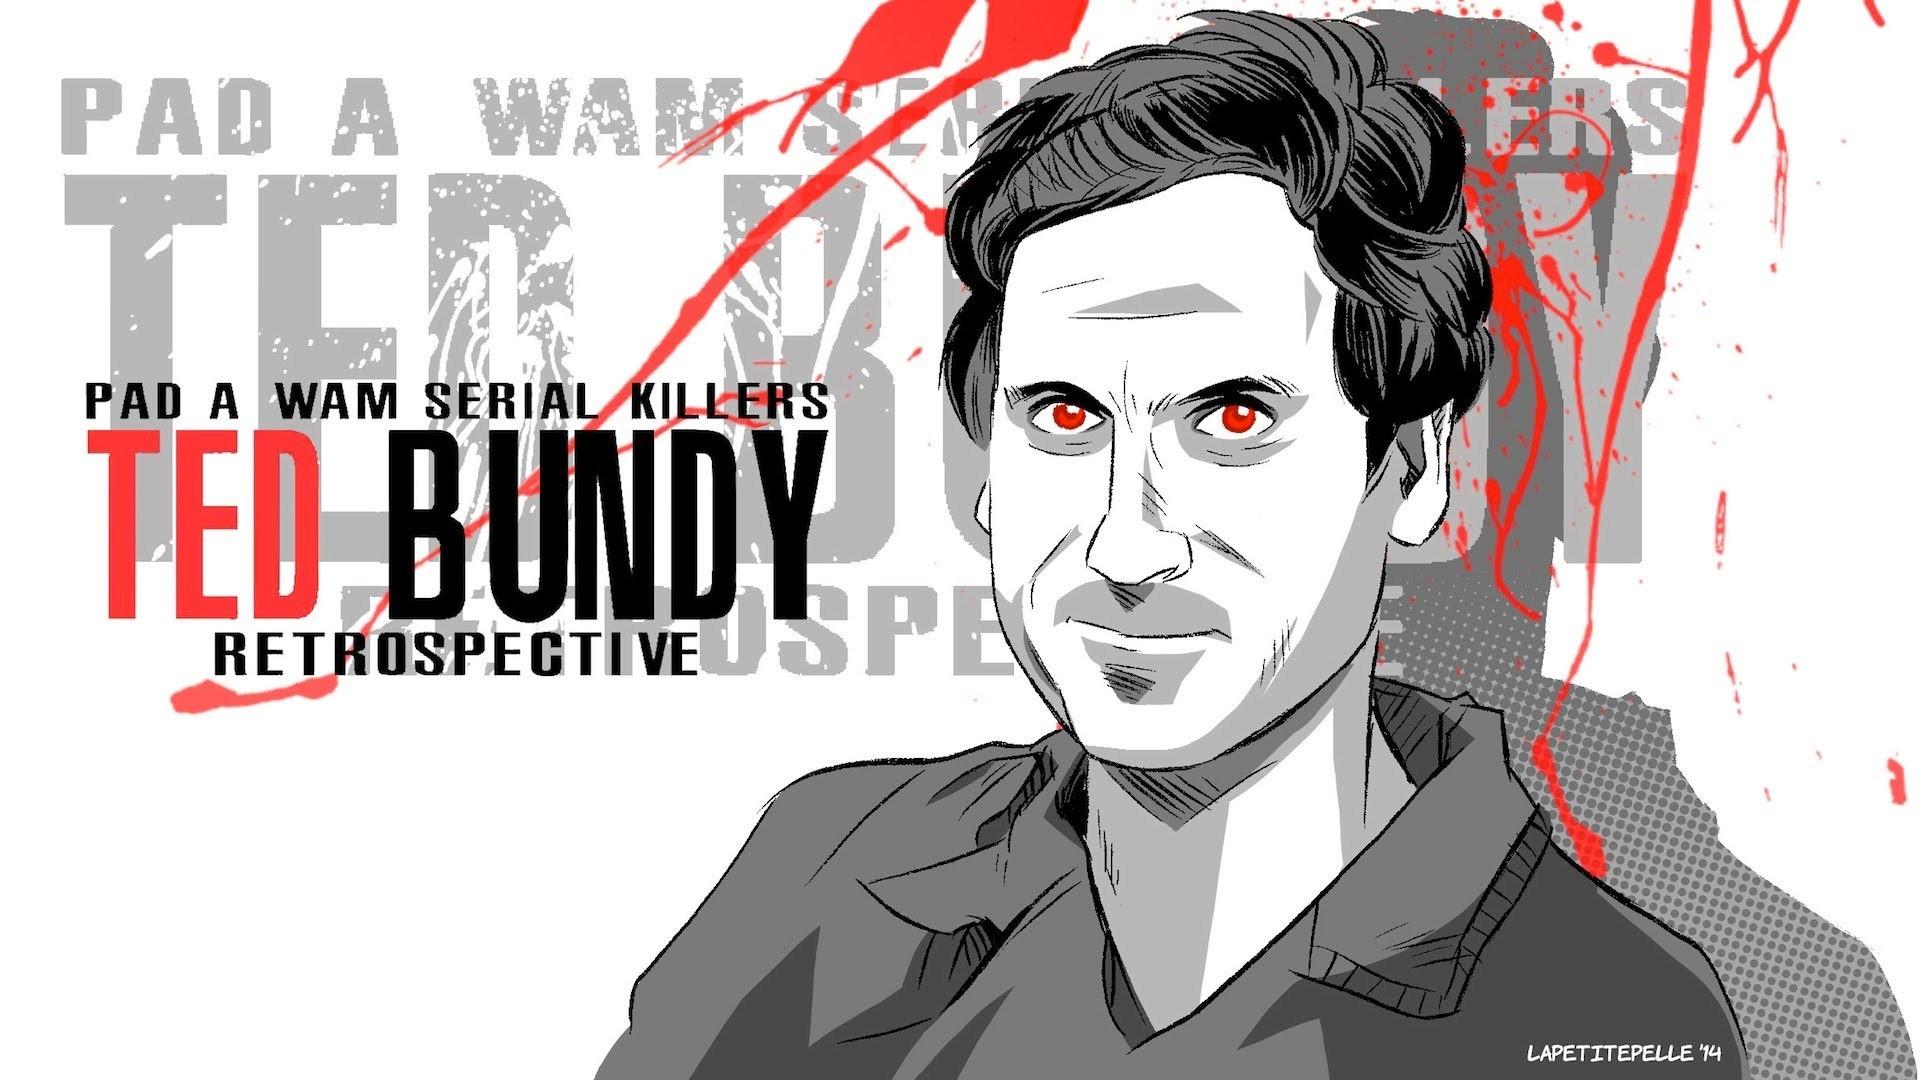 [PAD A WAM – SERIAL KILLERS] Retrospective – Ted Bundy (FR)